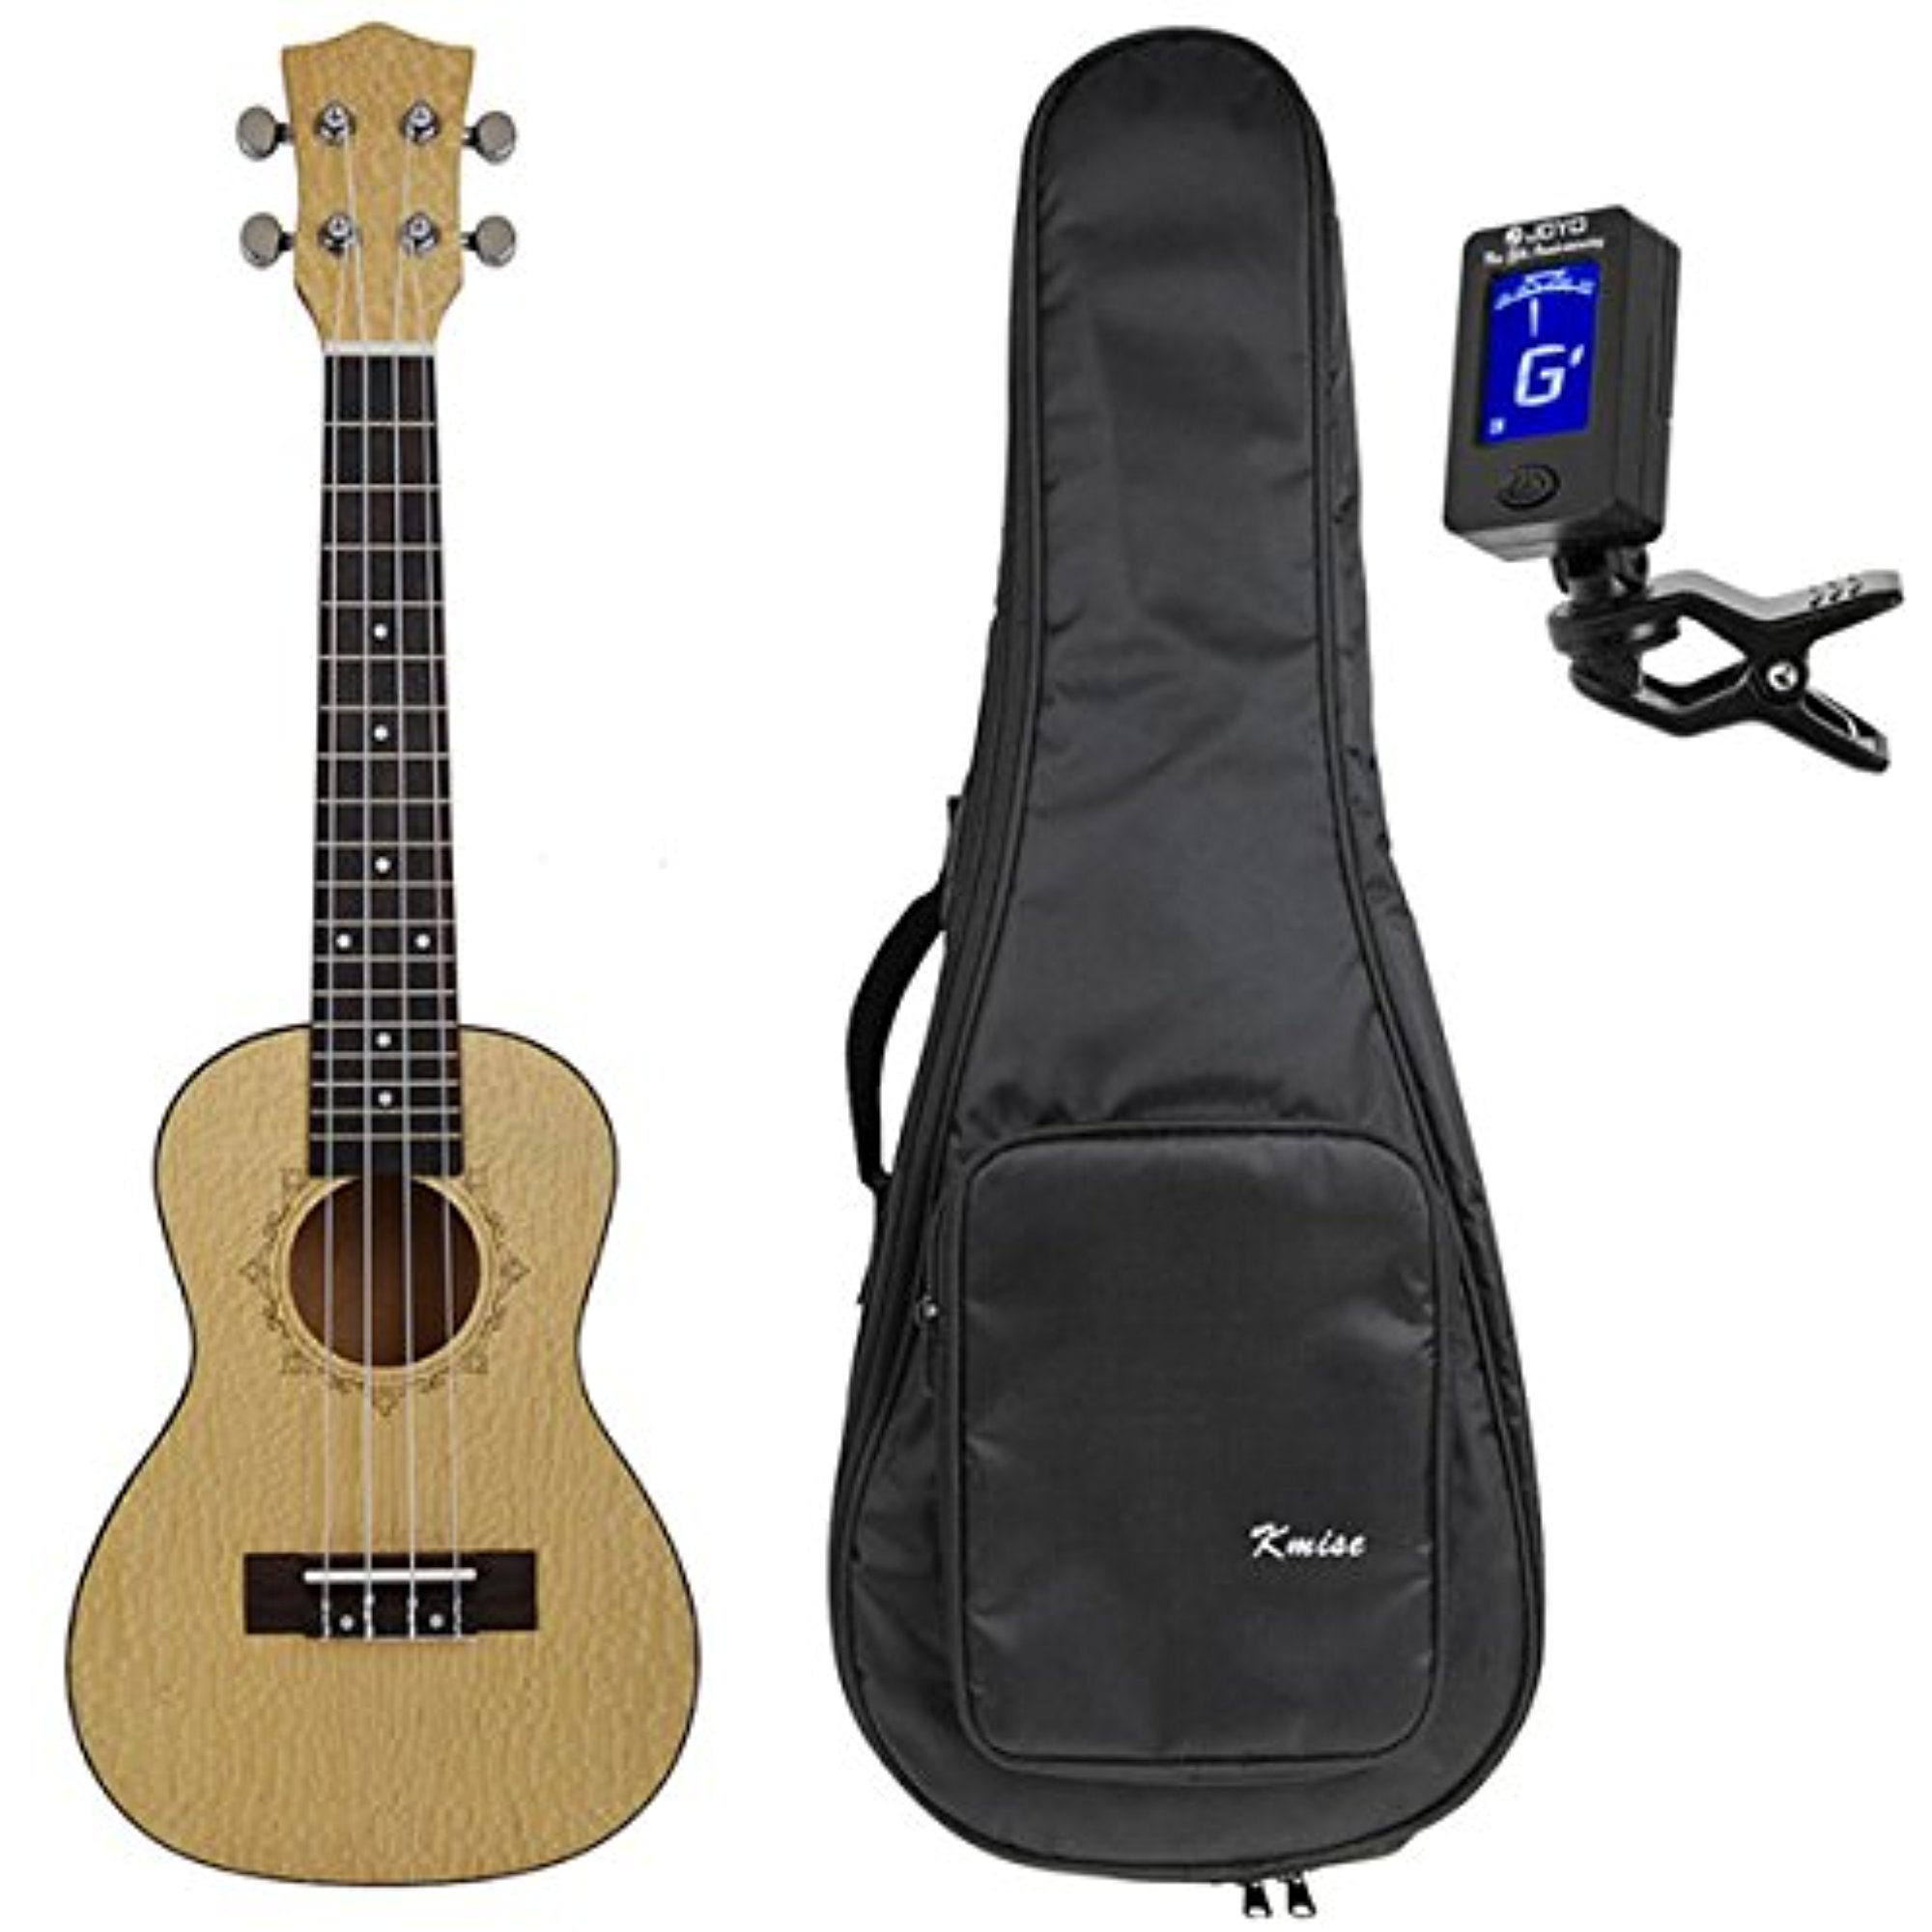 Kmise Professional 23 Inch Concert Ukulele Uke Hawaii Guitar Pearl Wood 18 Fret W Bag and... by Kmise